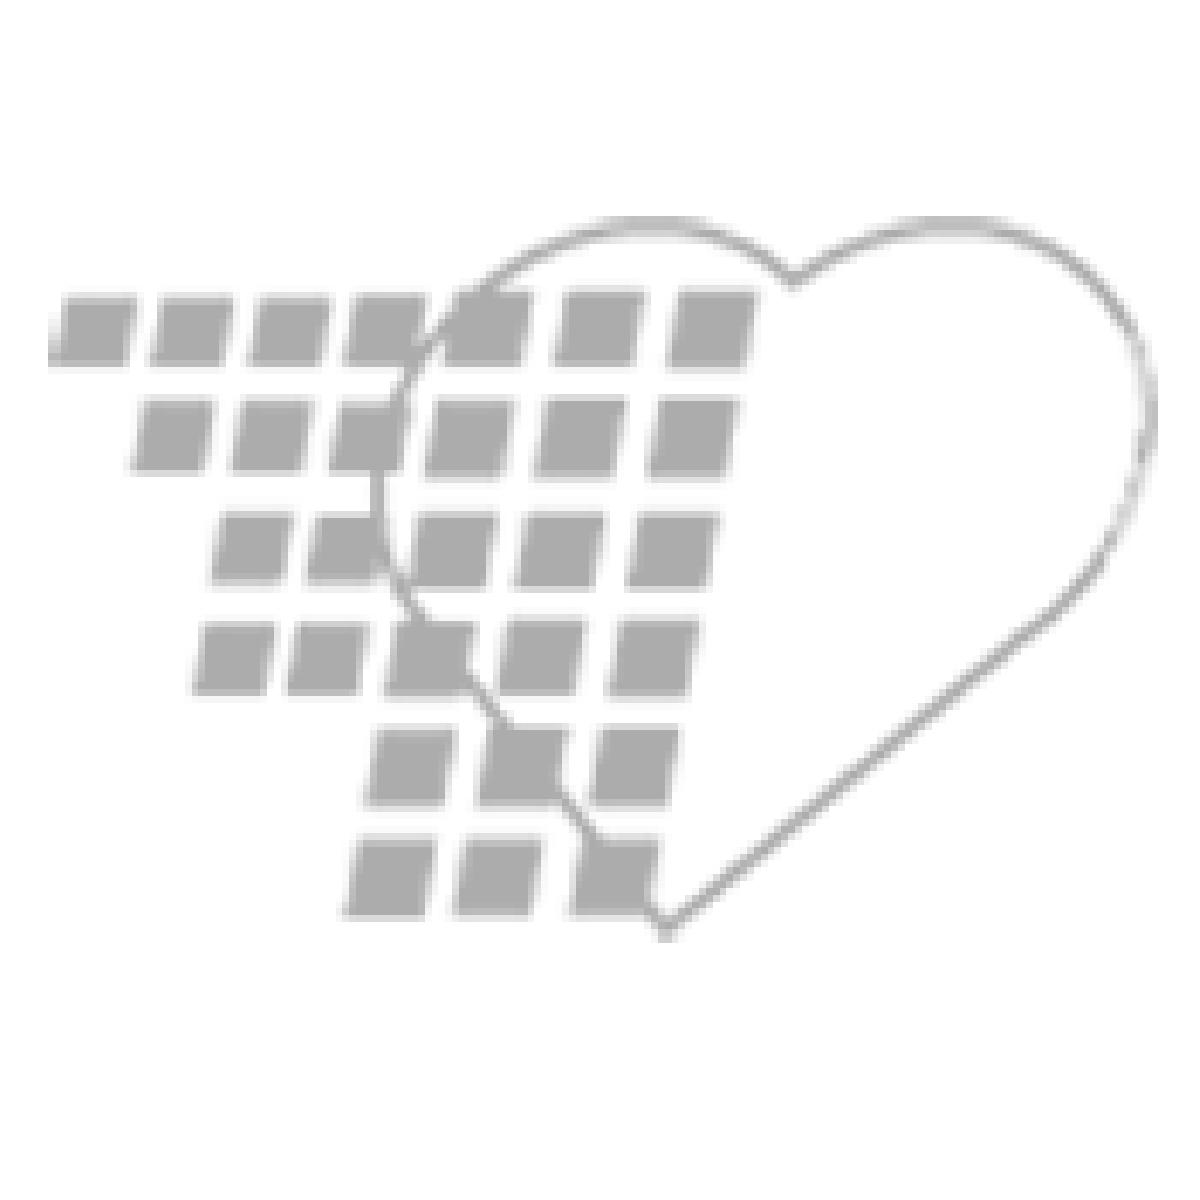 02-80-2139-BLKBURG - 3M   Littmann® Master Classic II   Teaching Stethoscope Black and Burgundy Tube 40 Inch